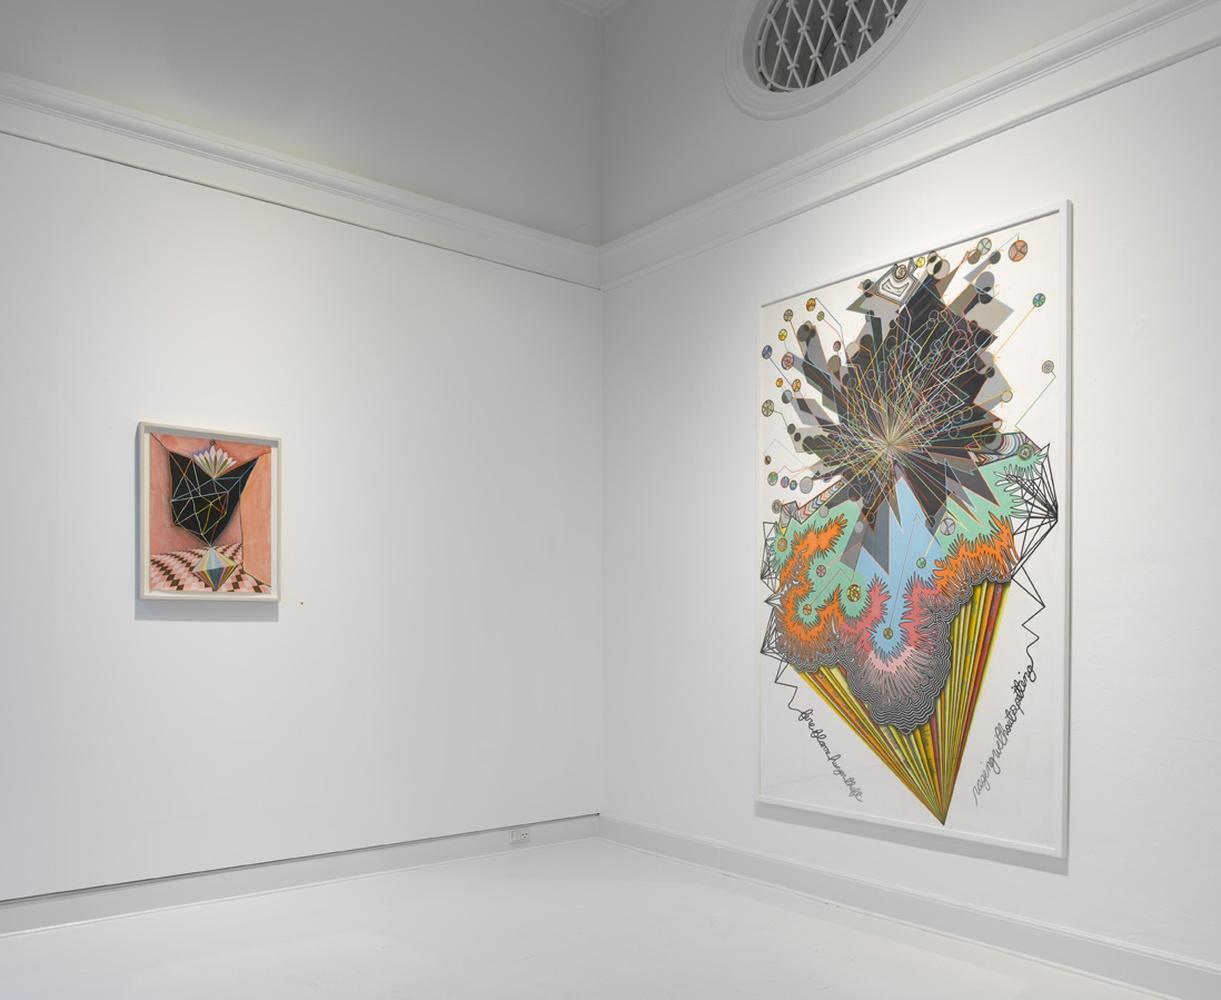 Exhibition at Marten Asbaek Gallery